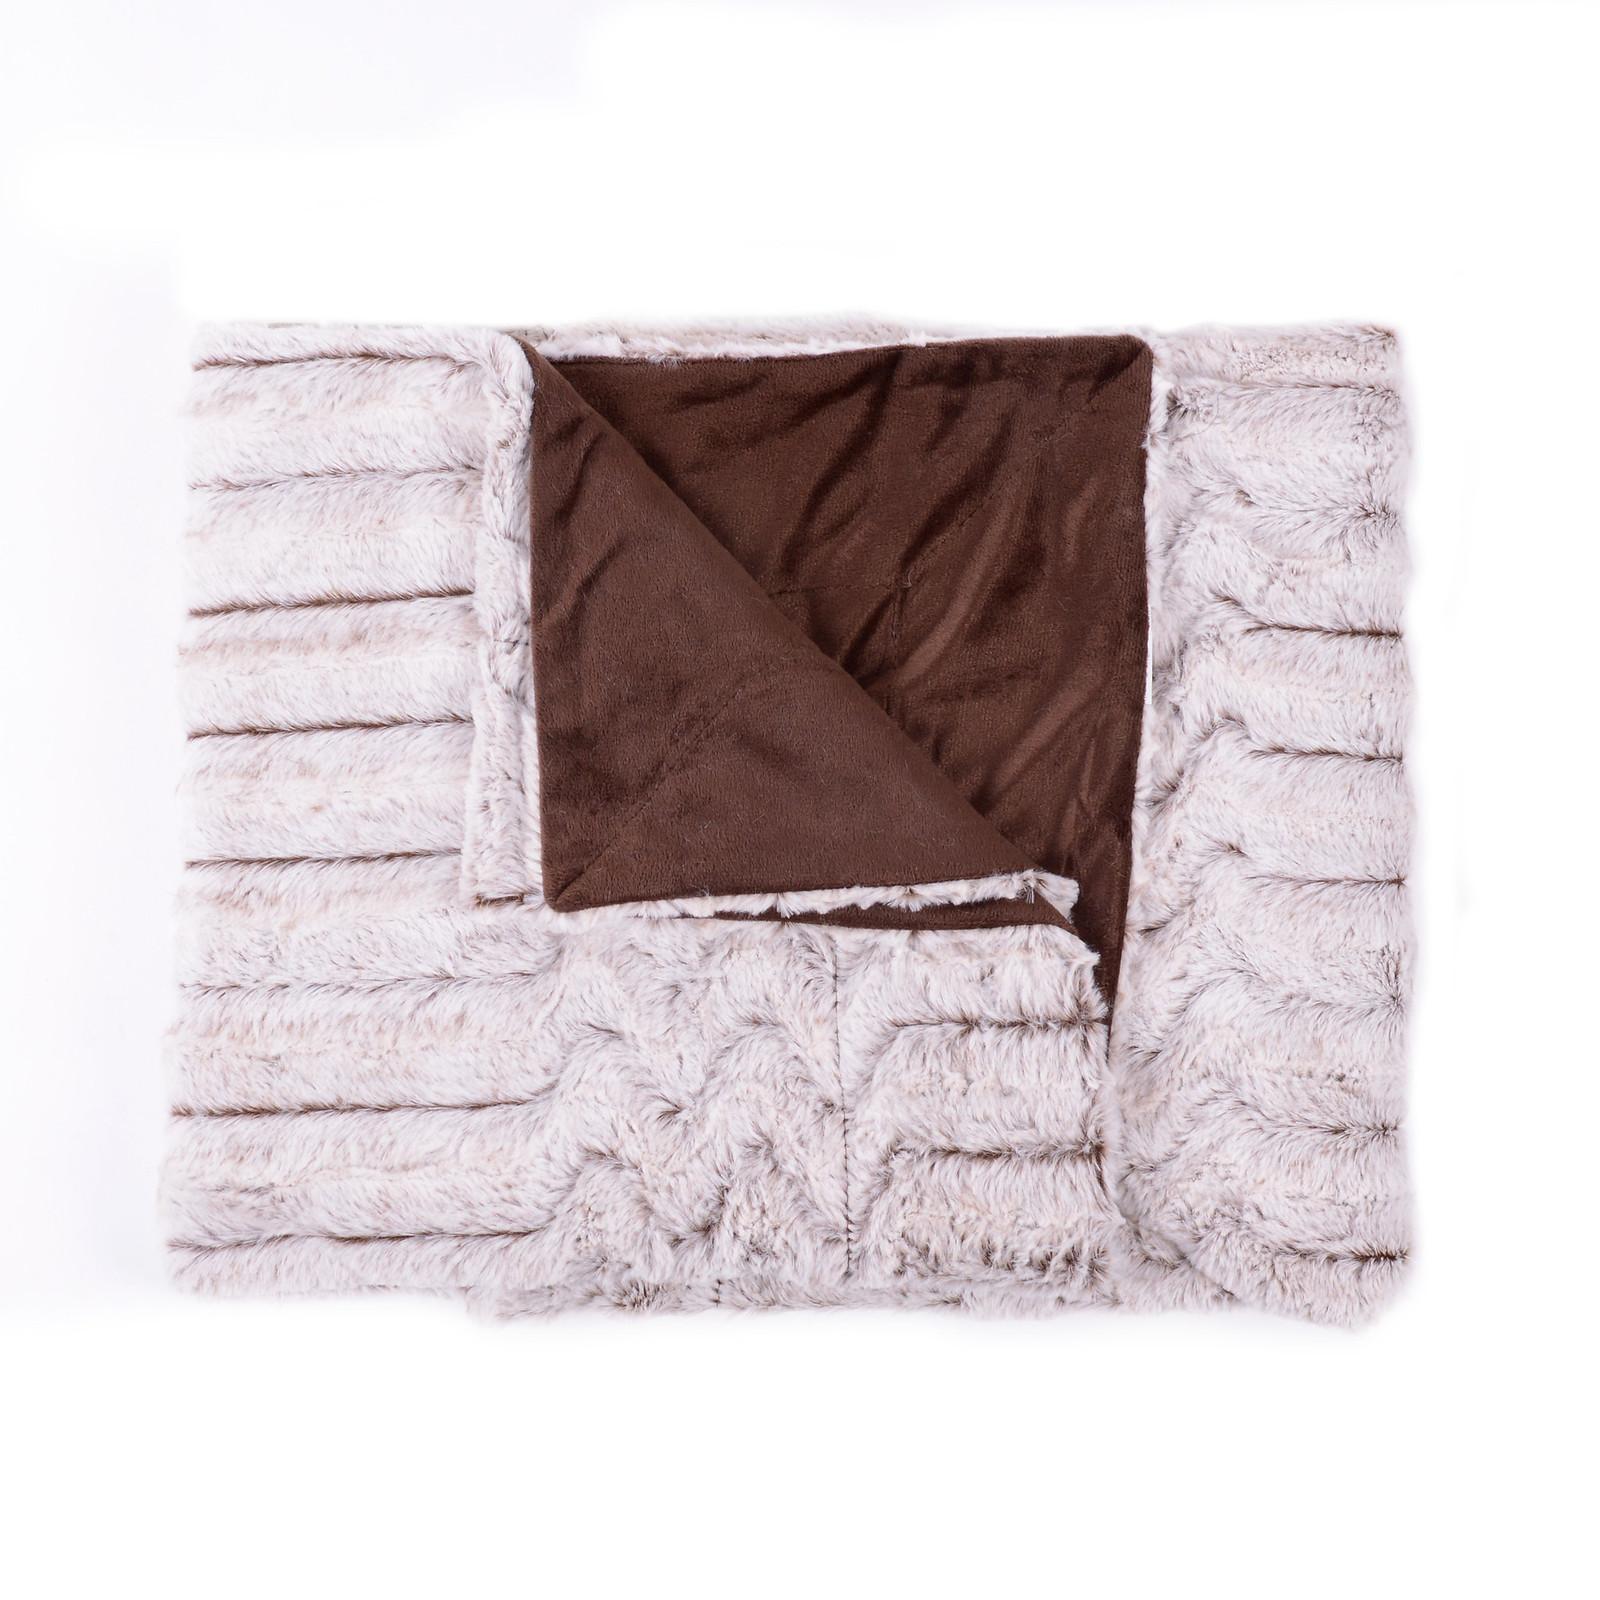 decorative reversible faux fur mink throw blanket 50 x 60 wave pattern ebay. Black Bedroom Furniture Sets. Home Design Ideas